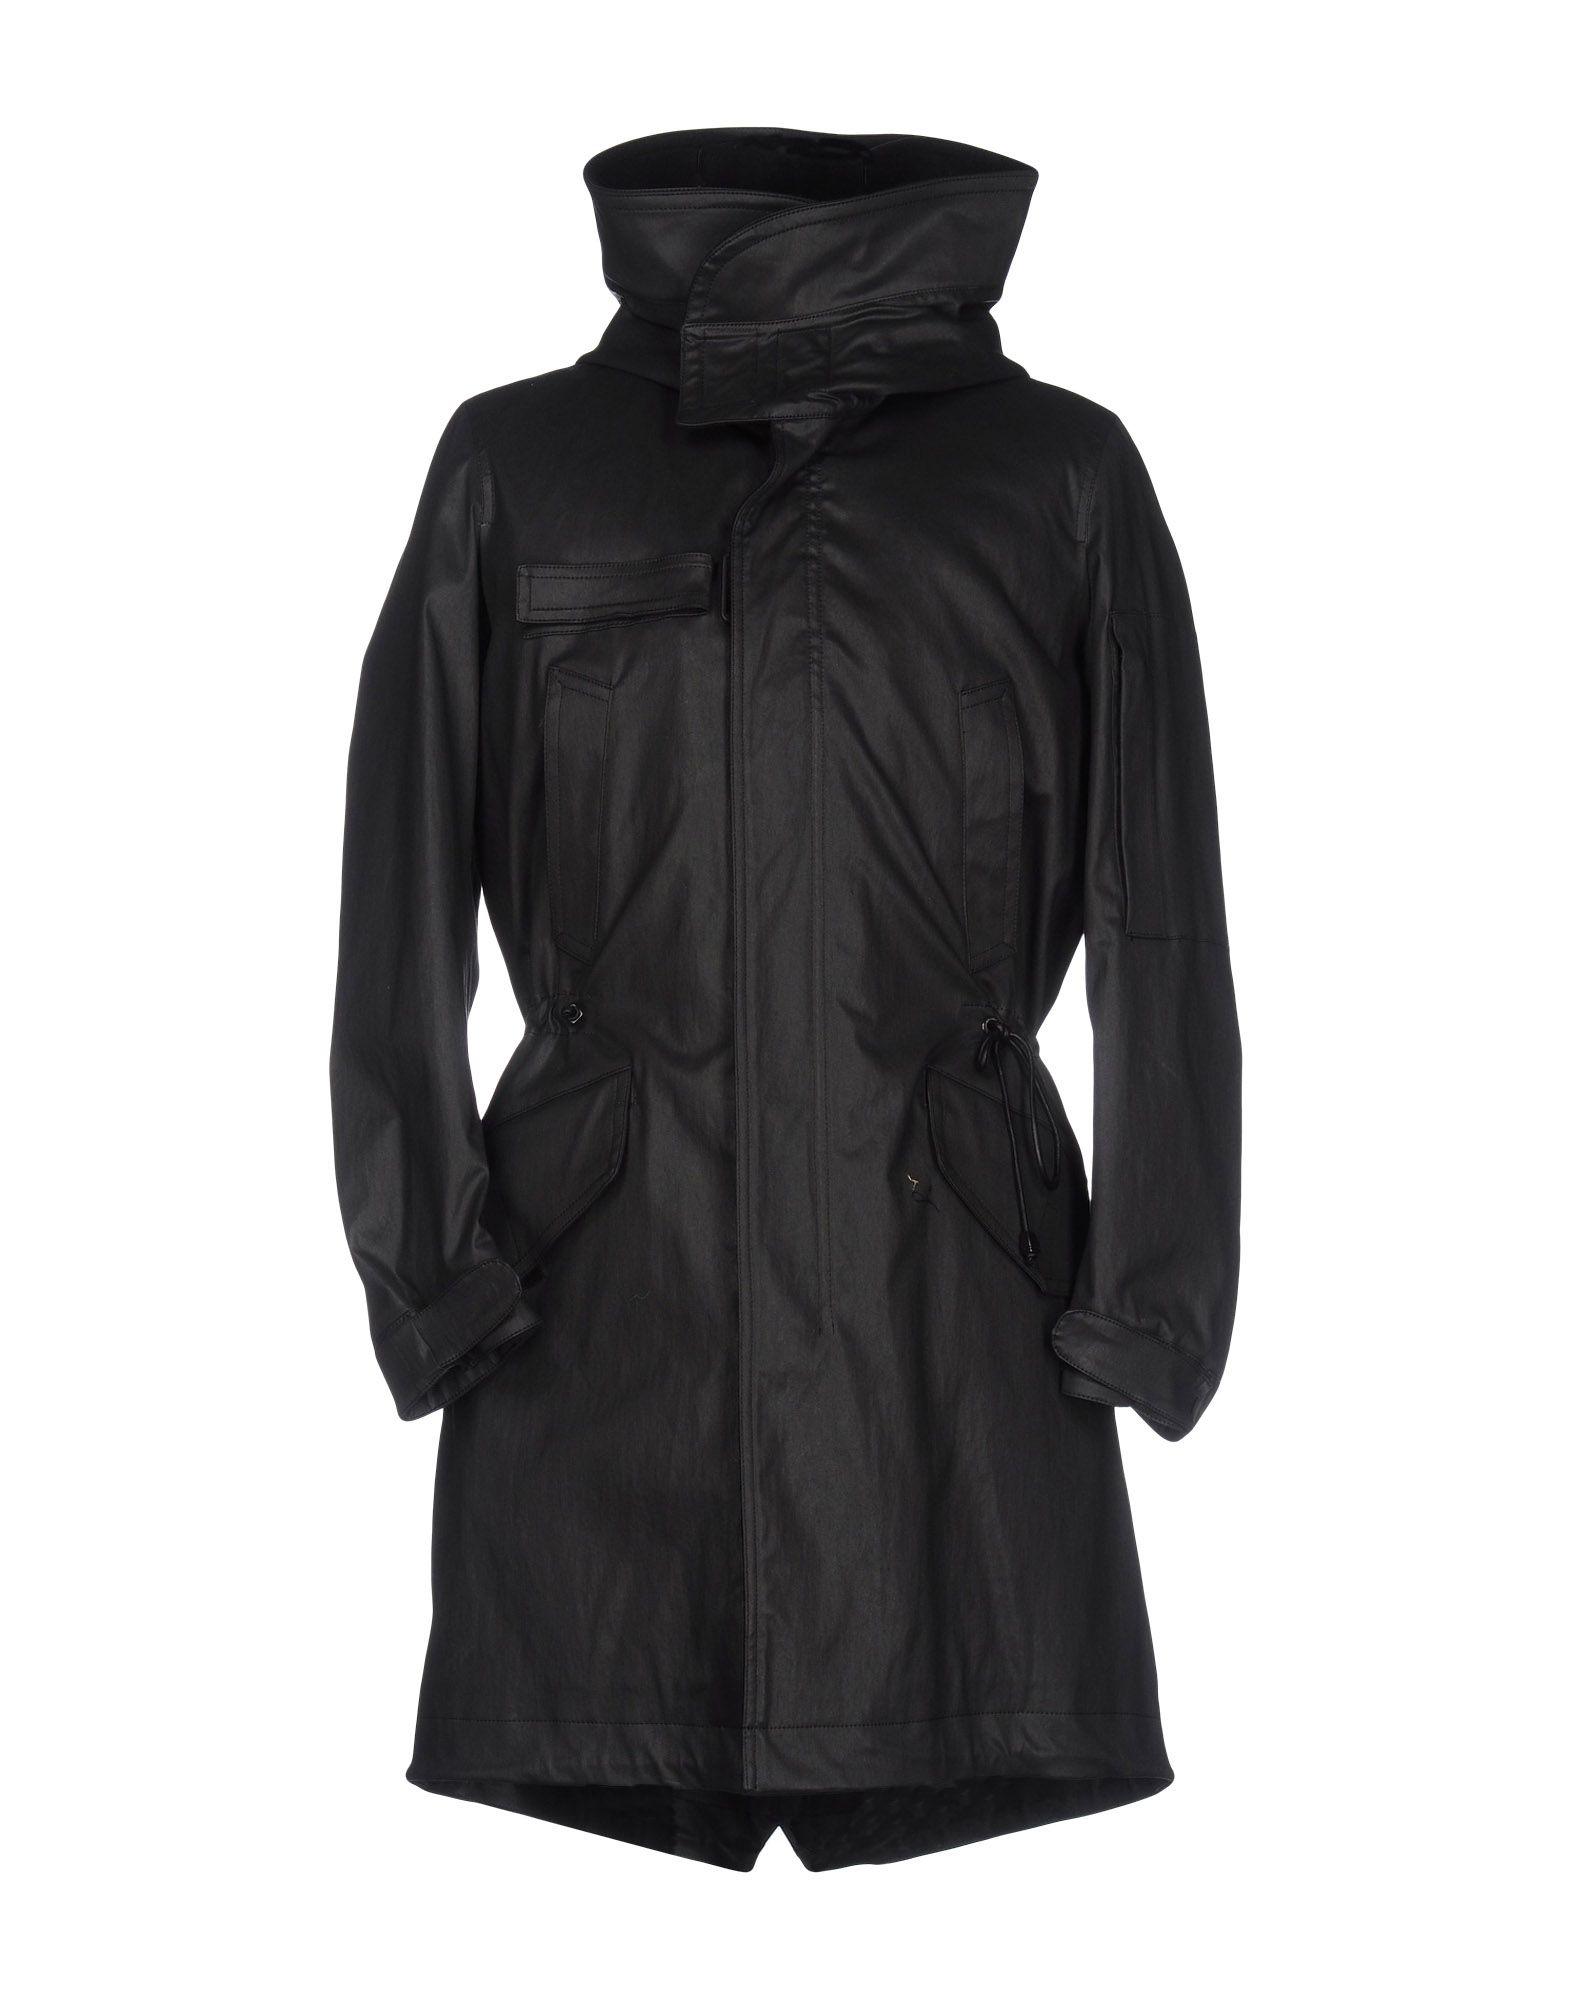 PROJECT -- [FOCE] -- SINGLESEASON -- Куртка project [foce] singleseason куртка